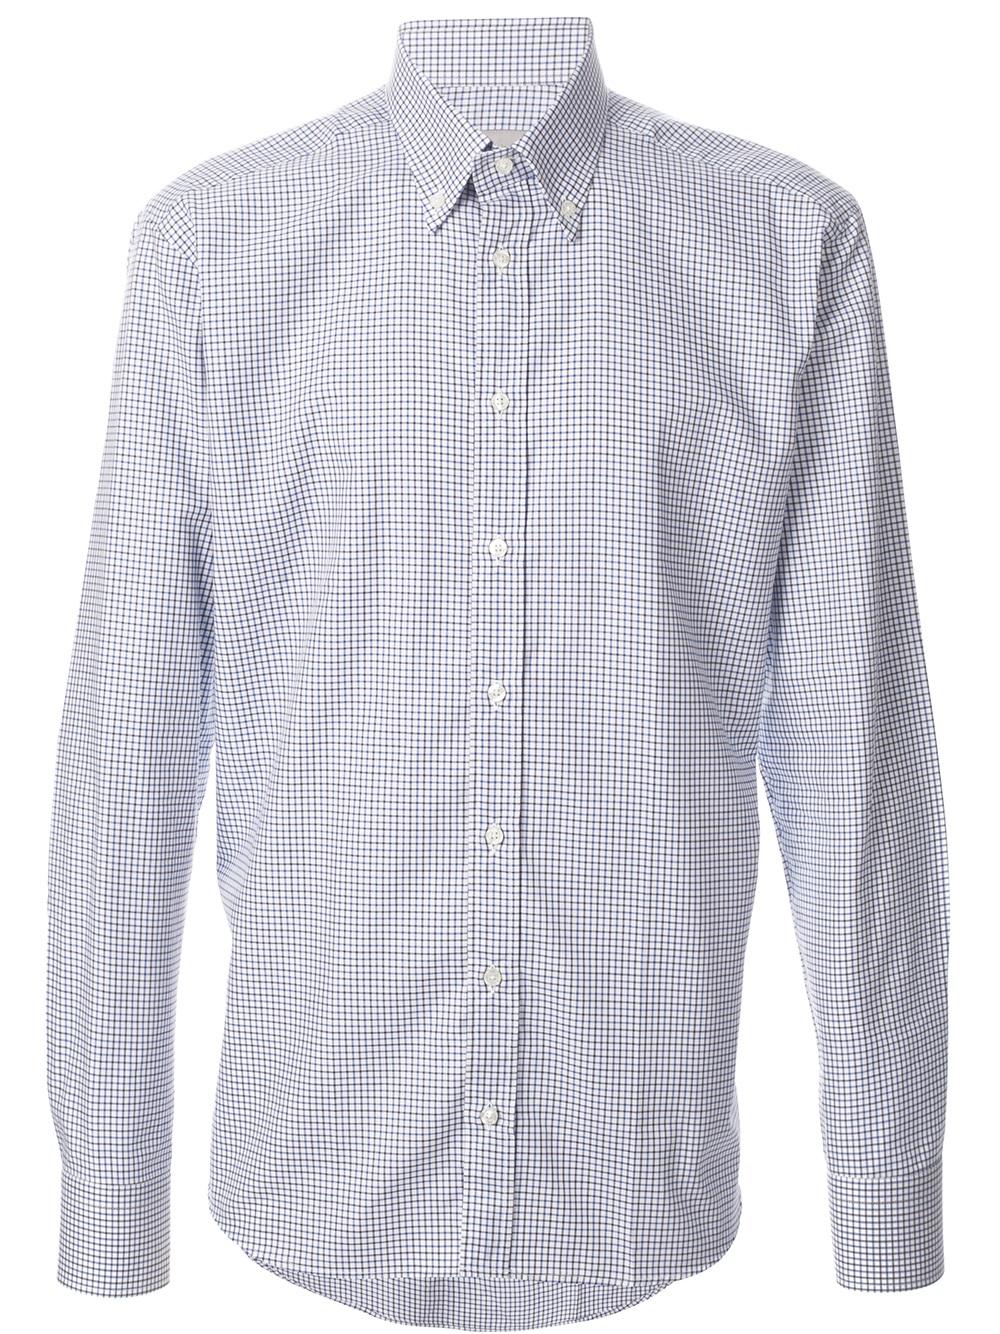 Etro Fine checked shirt vTX64J6